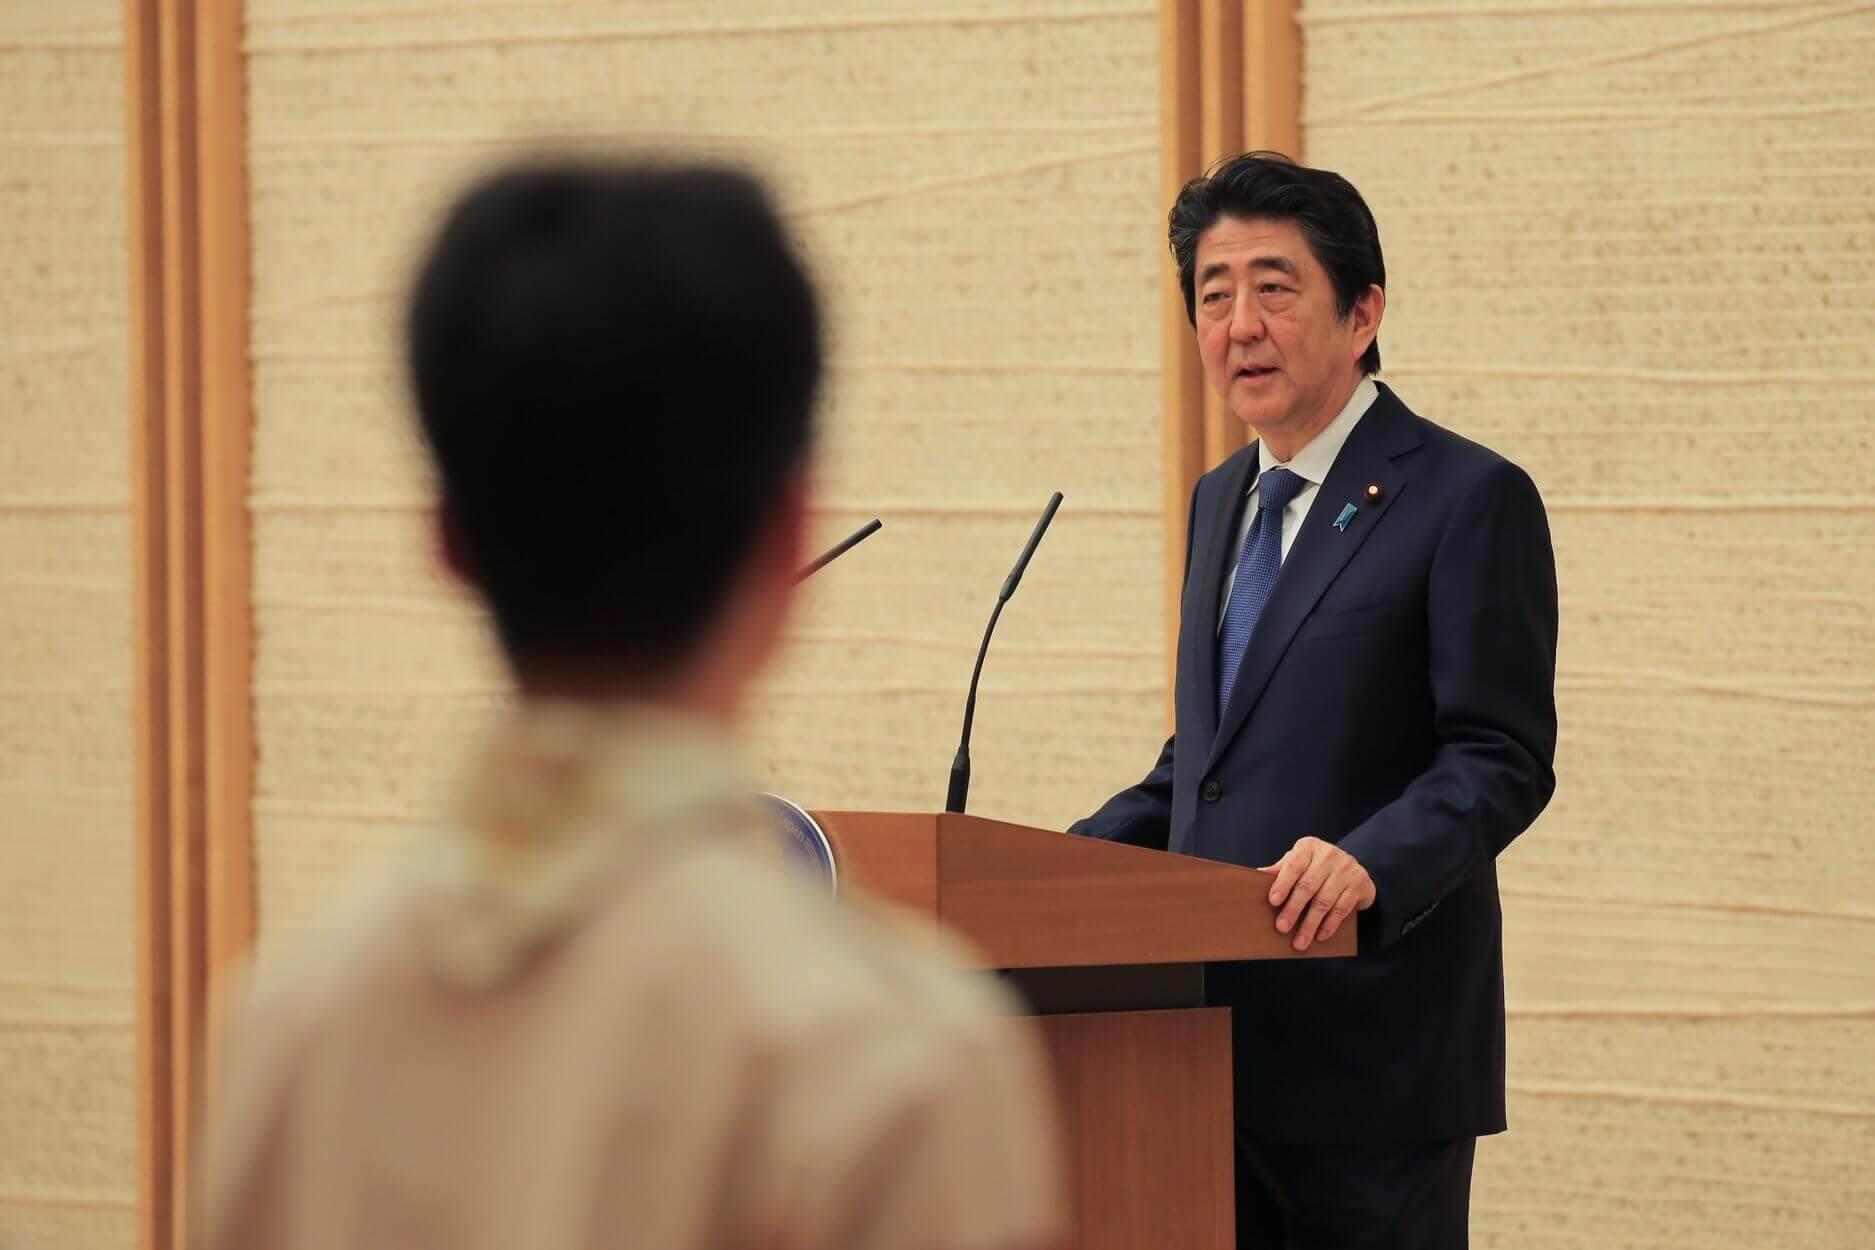 首相官邸へ表敬訪問